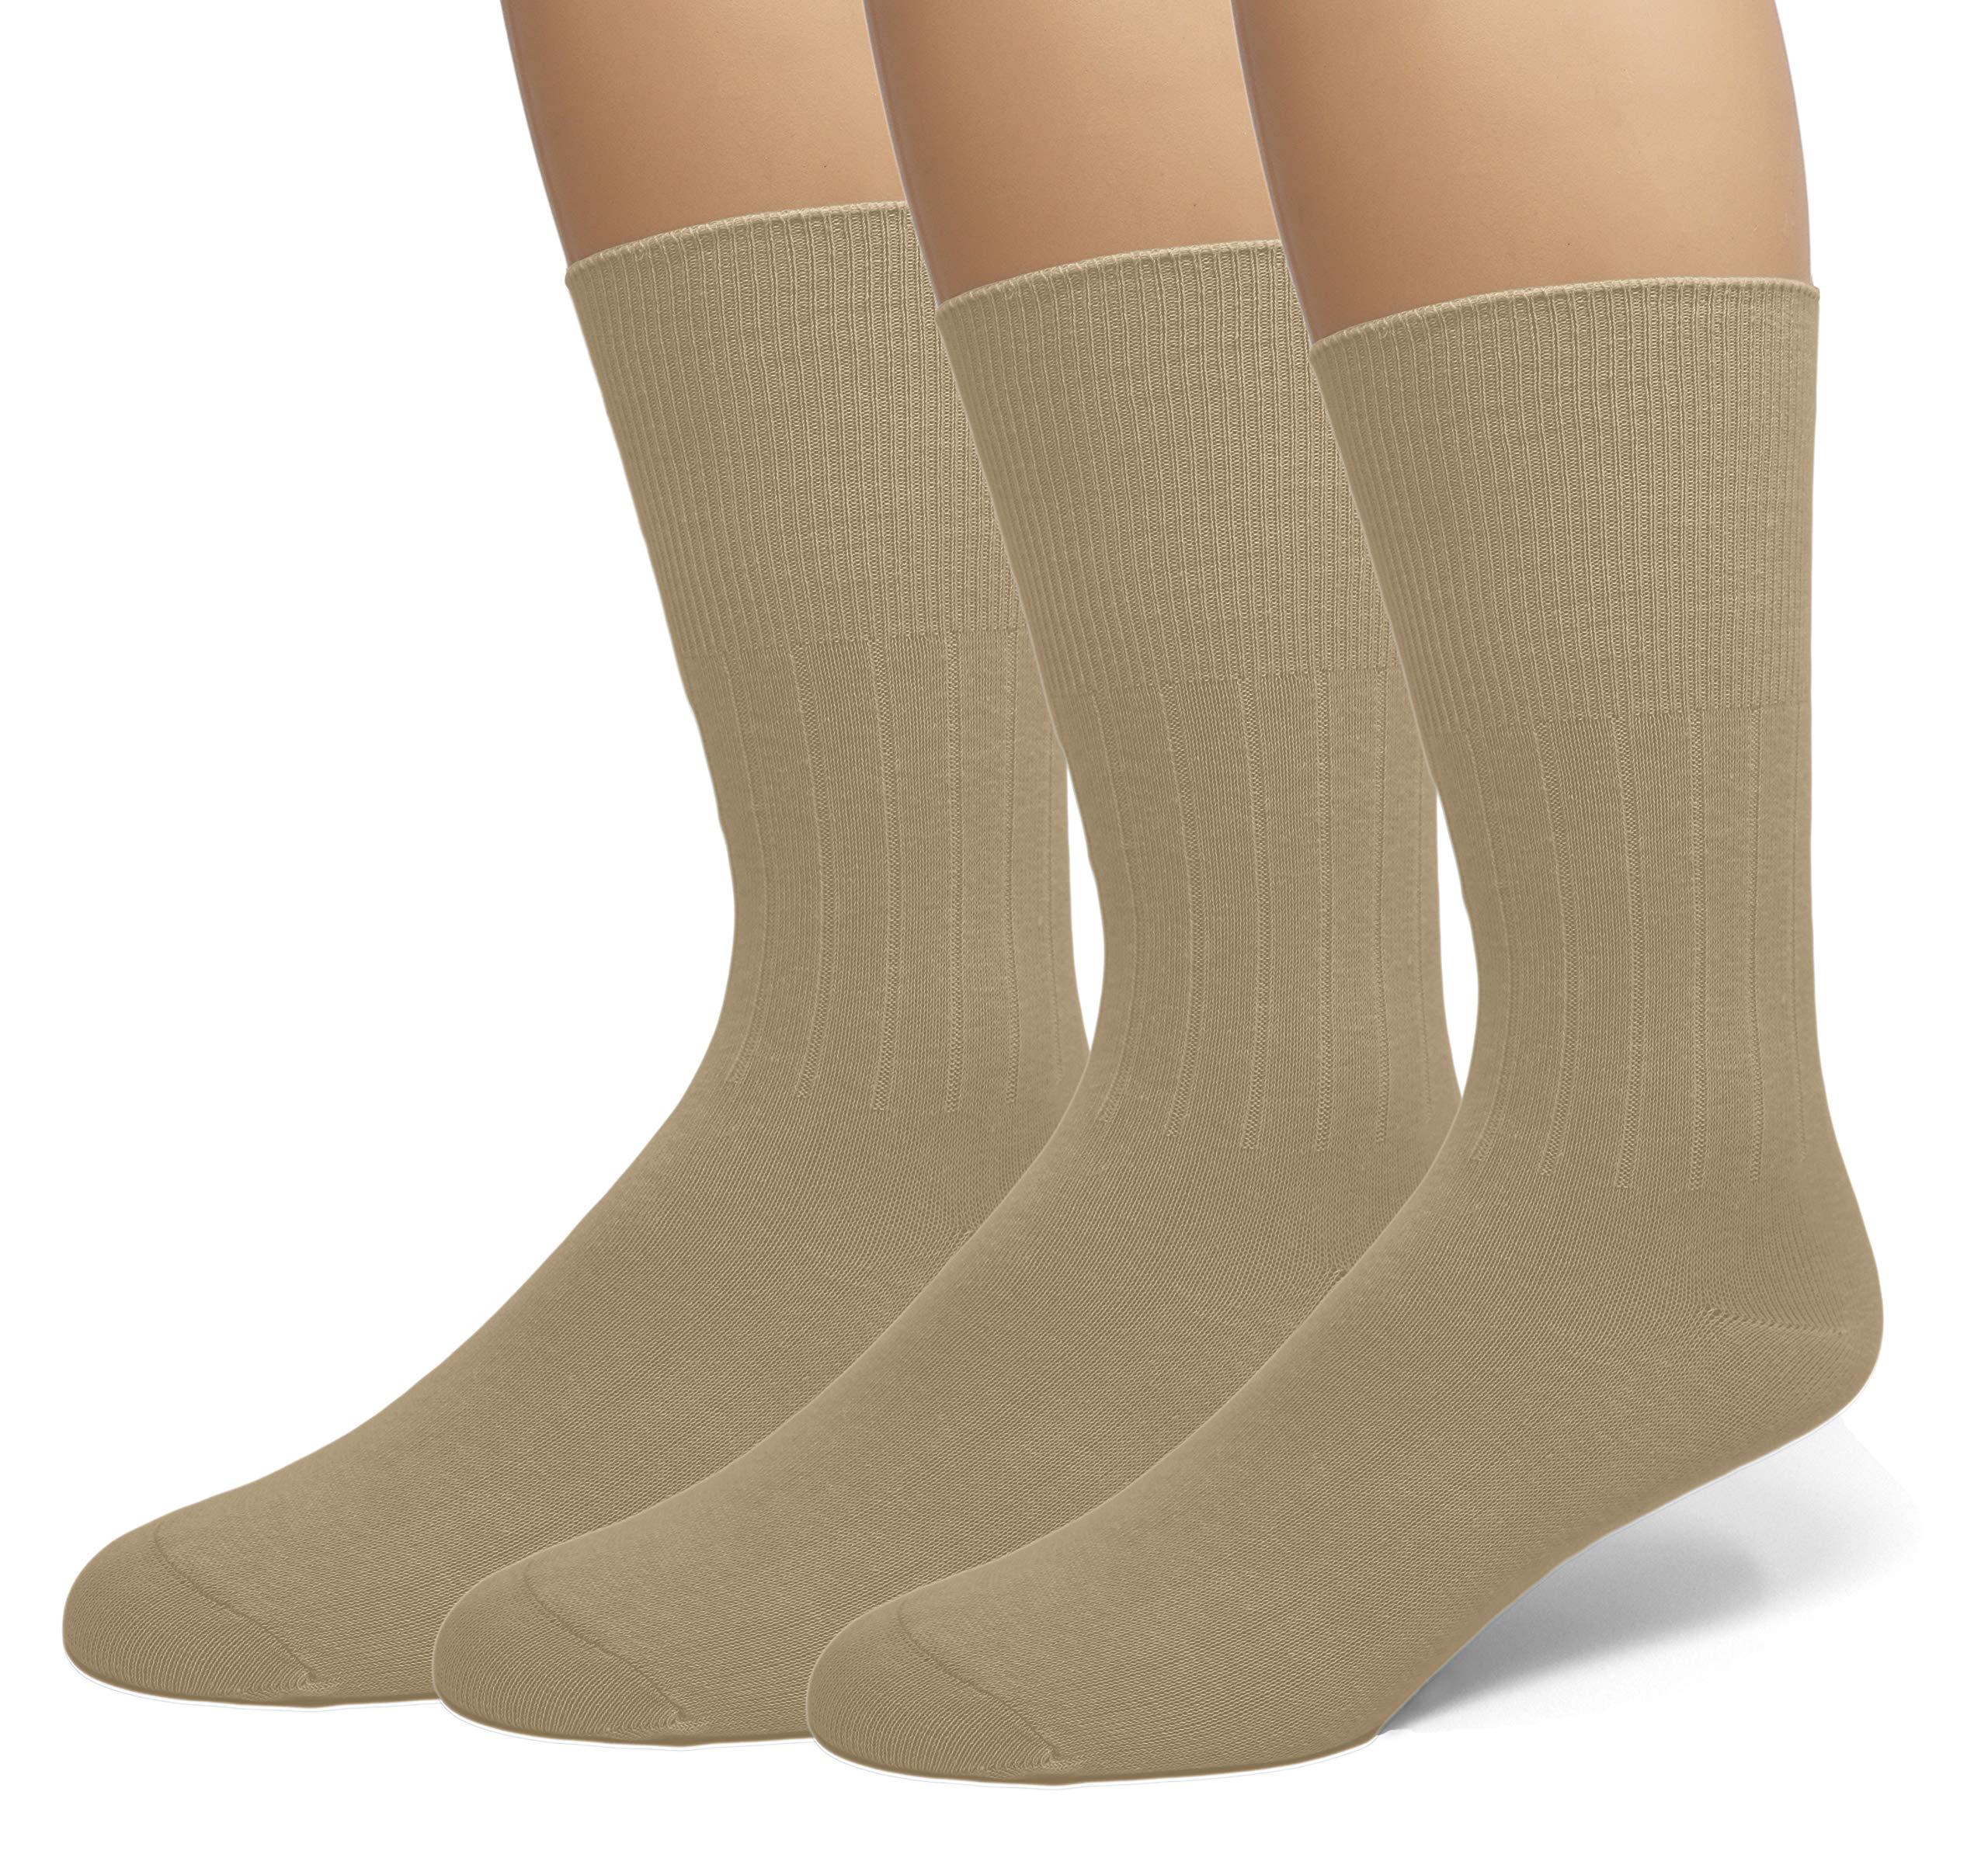 Classic Men's Diabetic Circulatory Non-Binding Top Loose Top Casual Dress Crew Mid Calf Cotton Seamless Toe Hosiery Socks 3-Pack Khaki 10-13